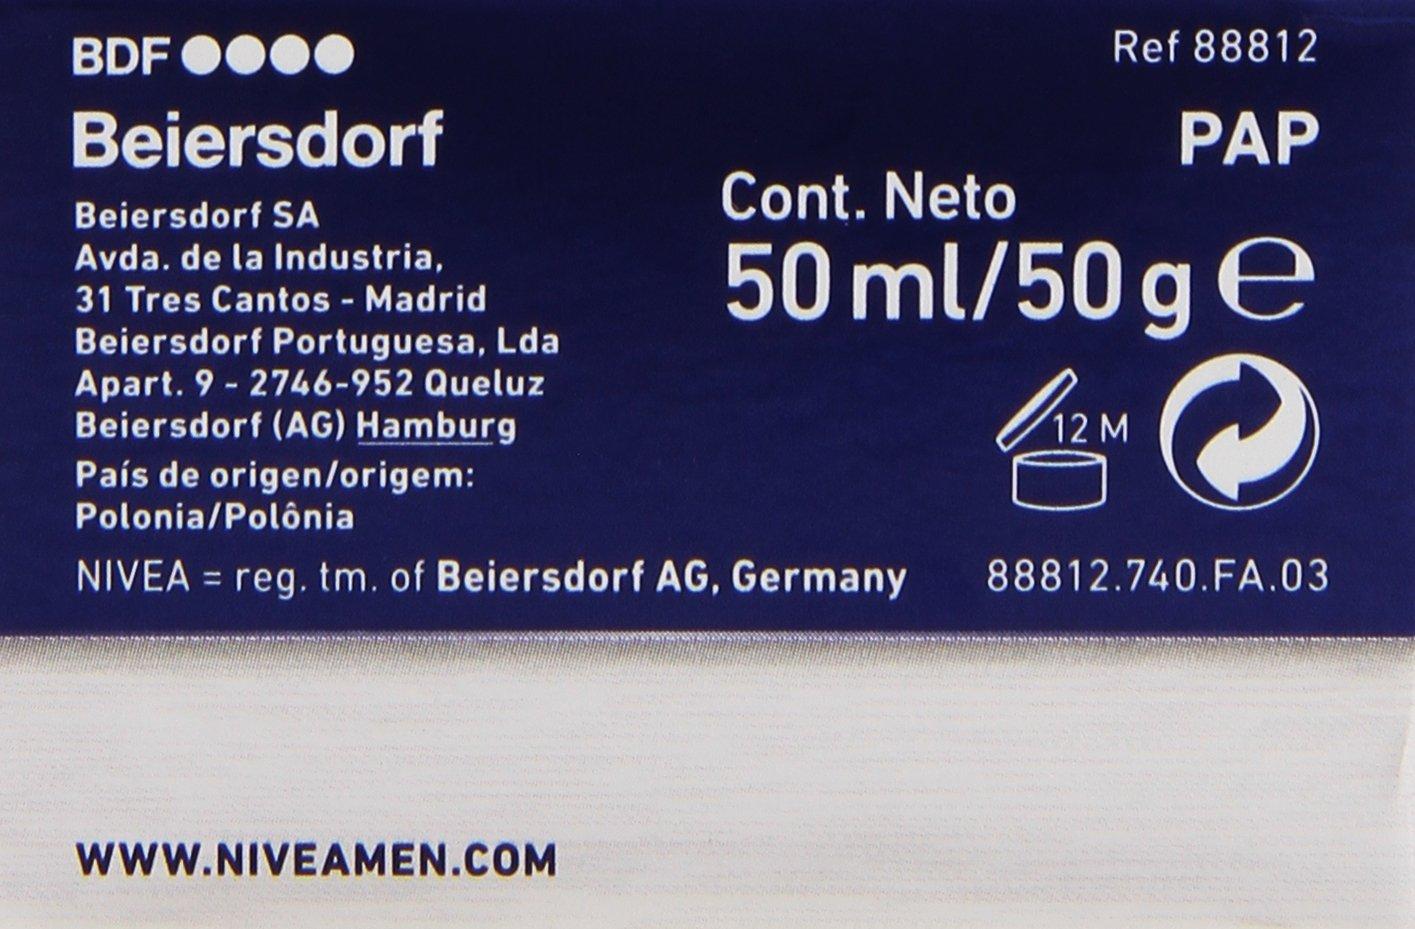 Nivea Men Crema Hidratante Intensiva Originals - 50 ml: Amazon.es: Amazon Pantry